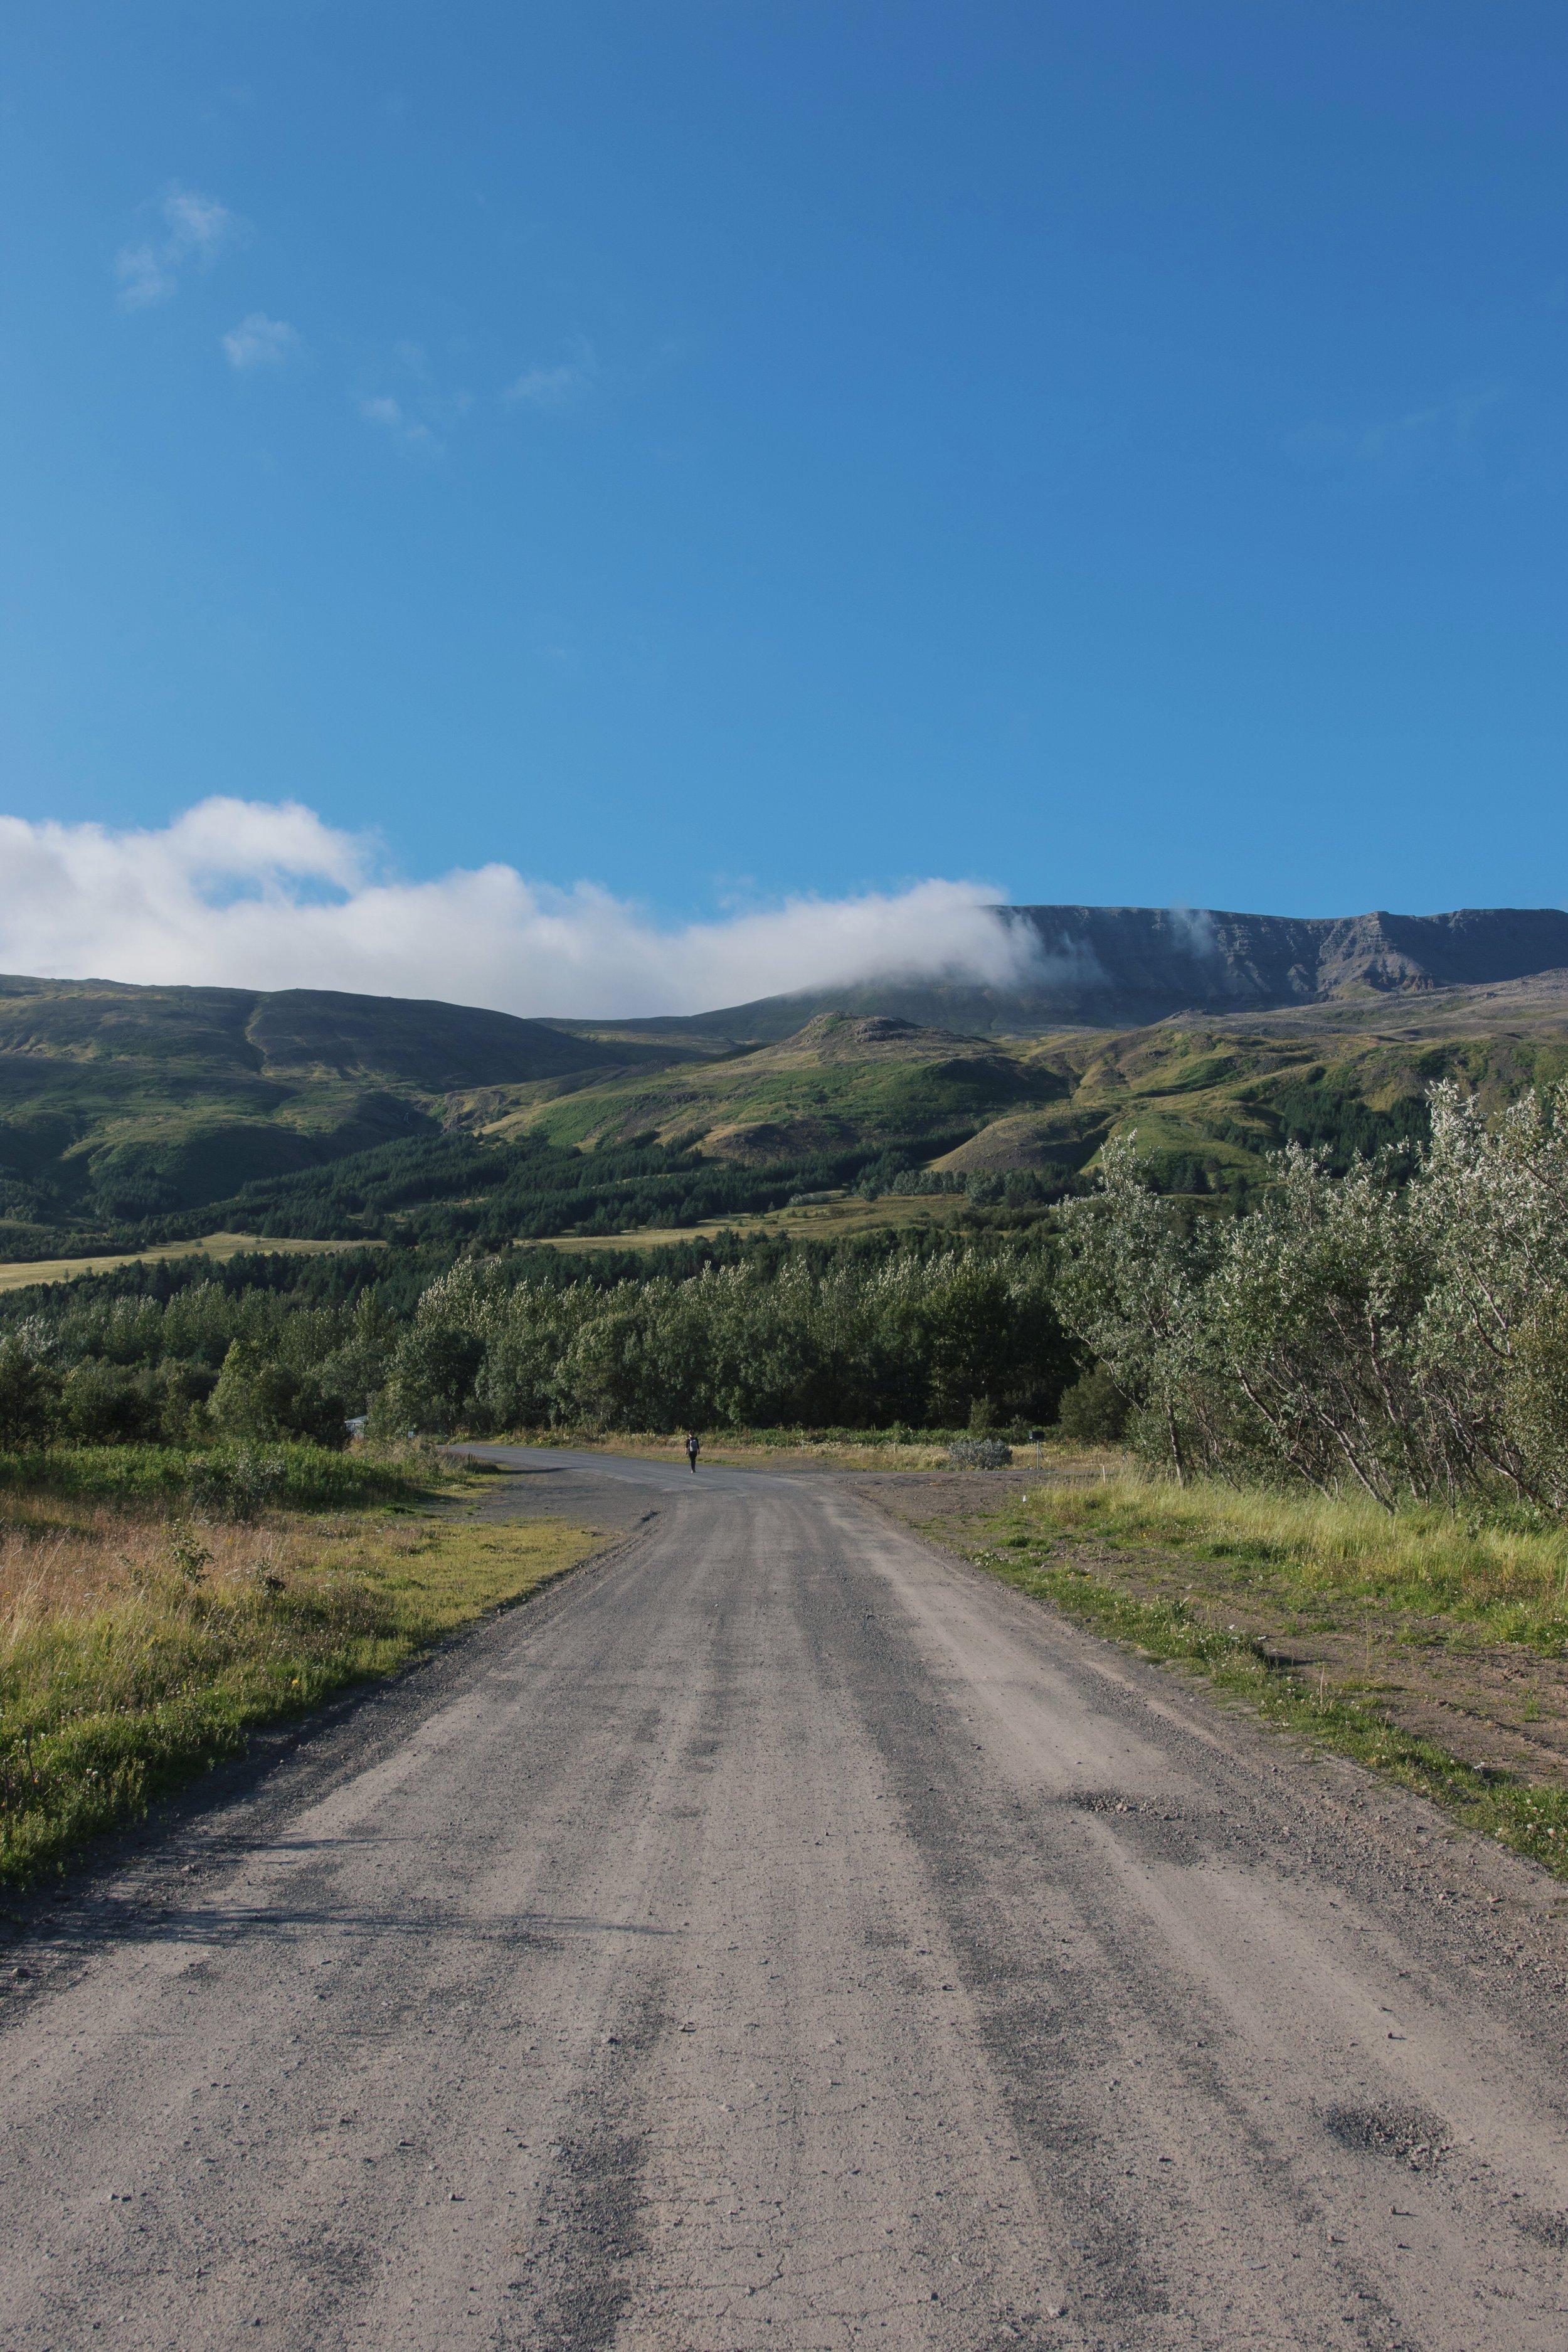 CharlesKang Iceland '18 4.JPG